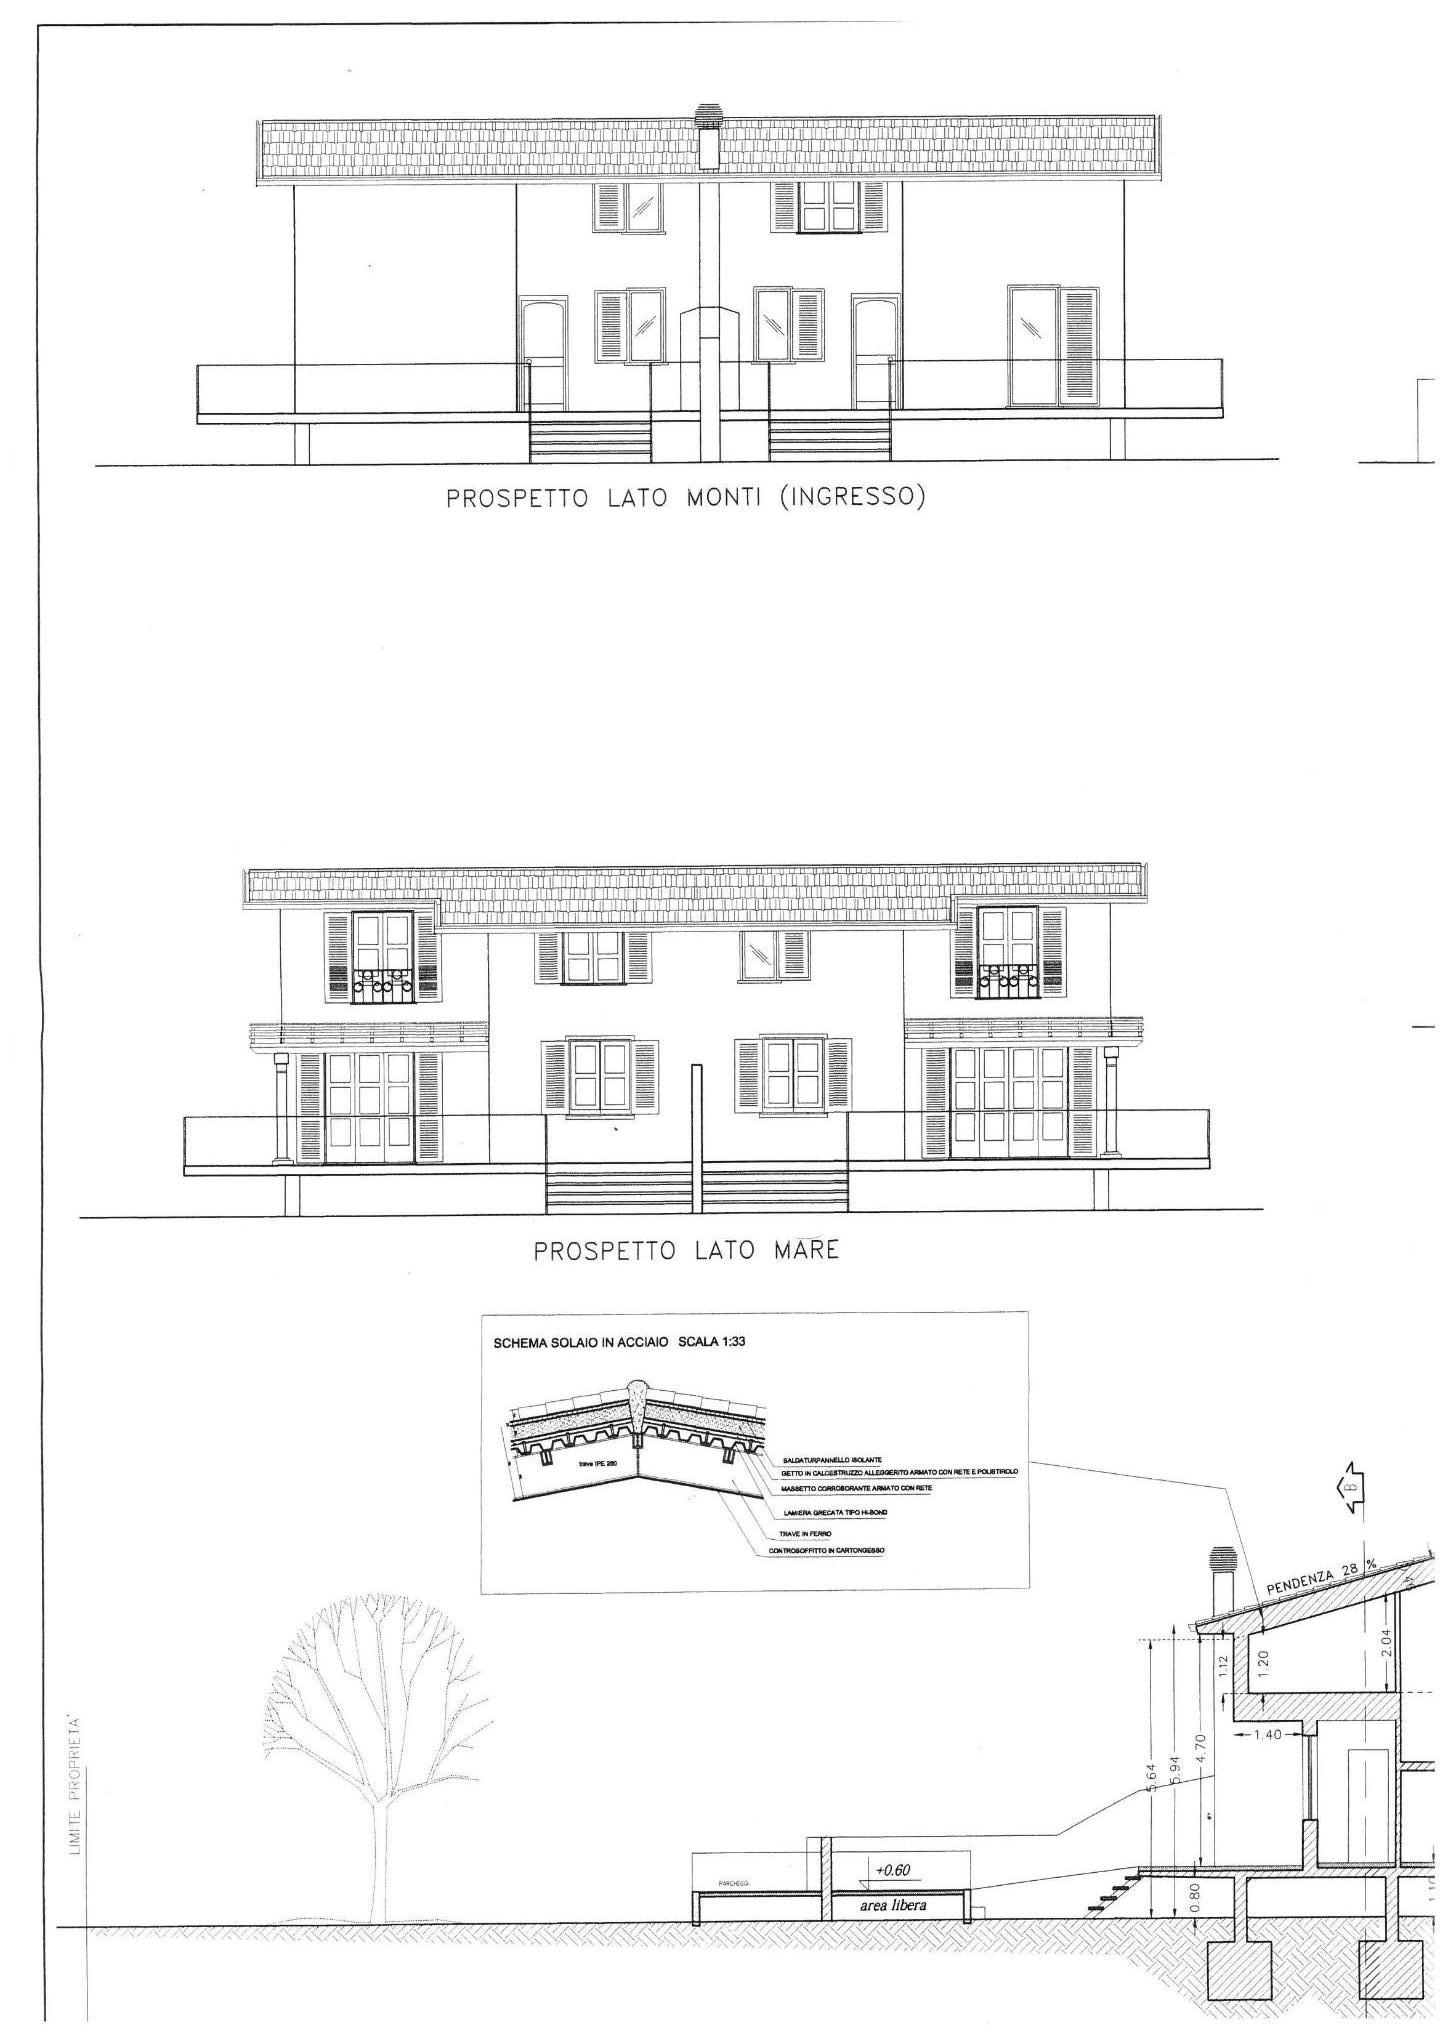 Terreno edif. residenziale in vendita a Carrara (MS)